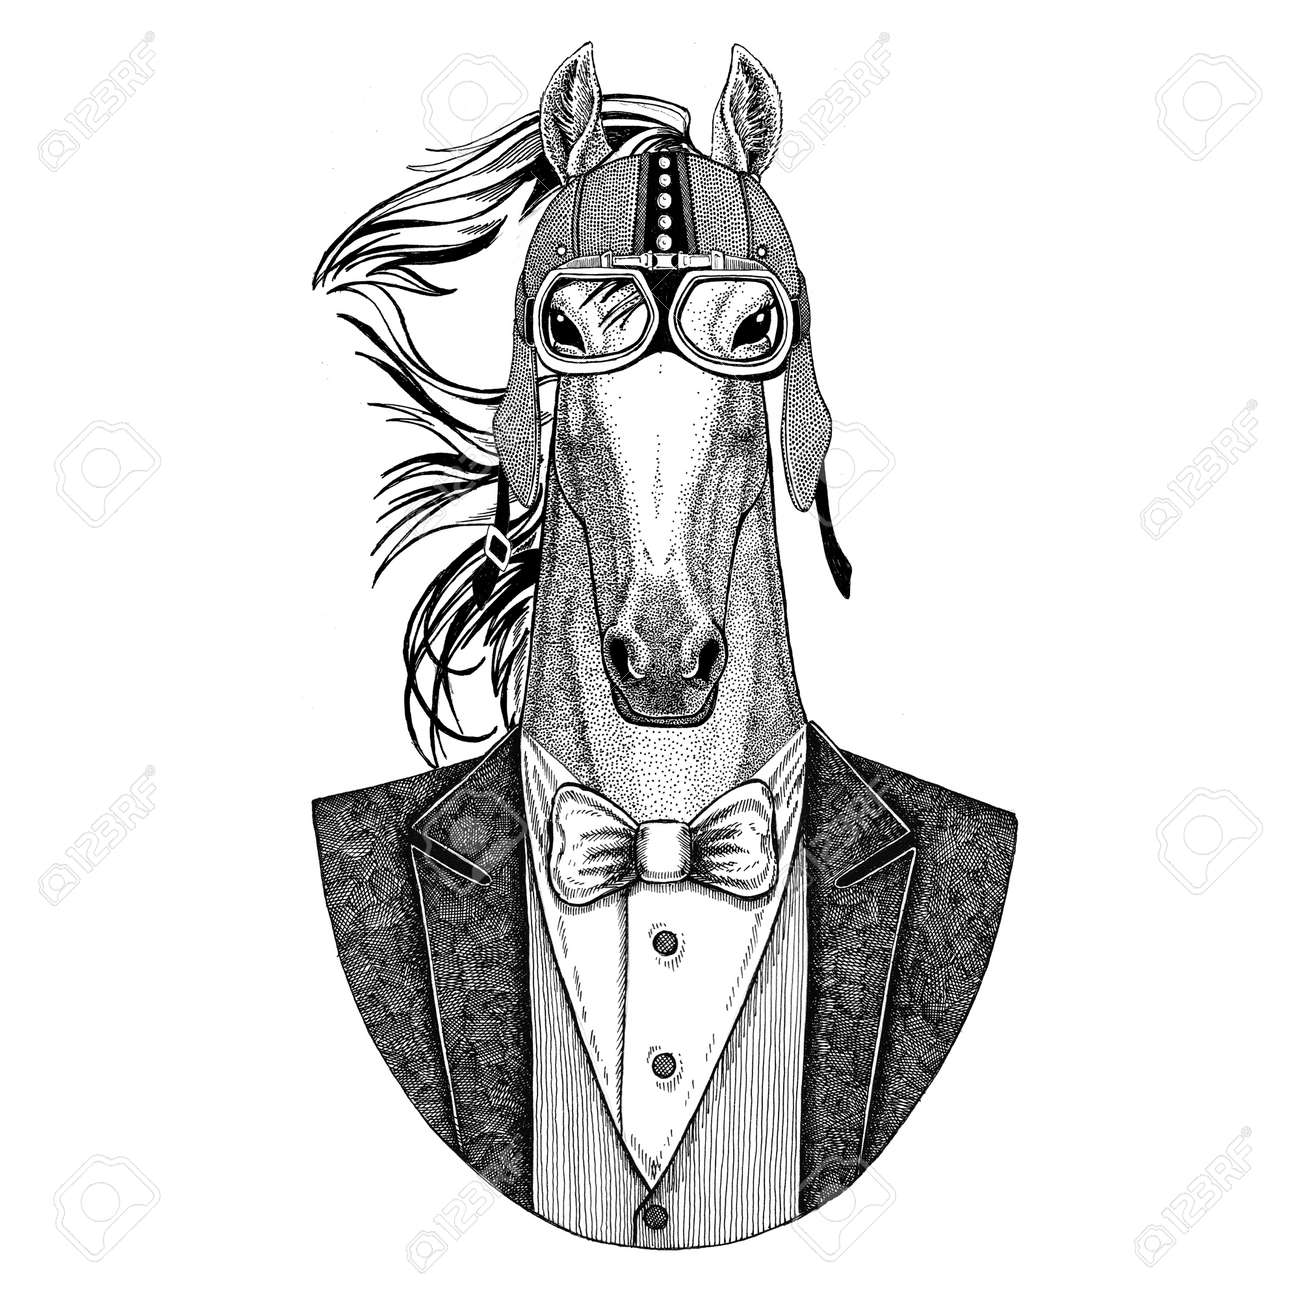 dc00d8096 Horse